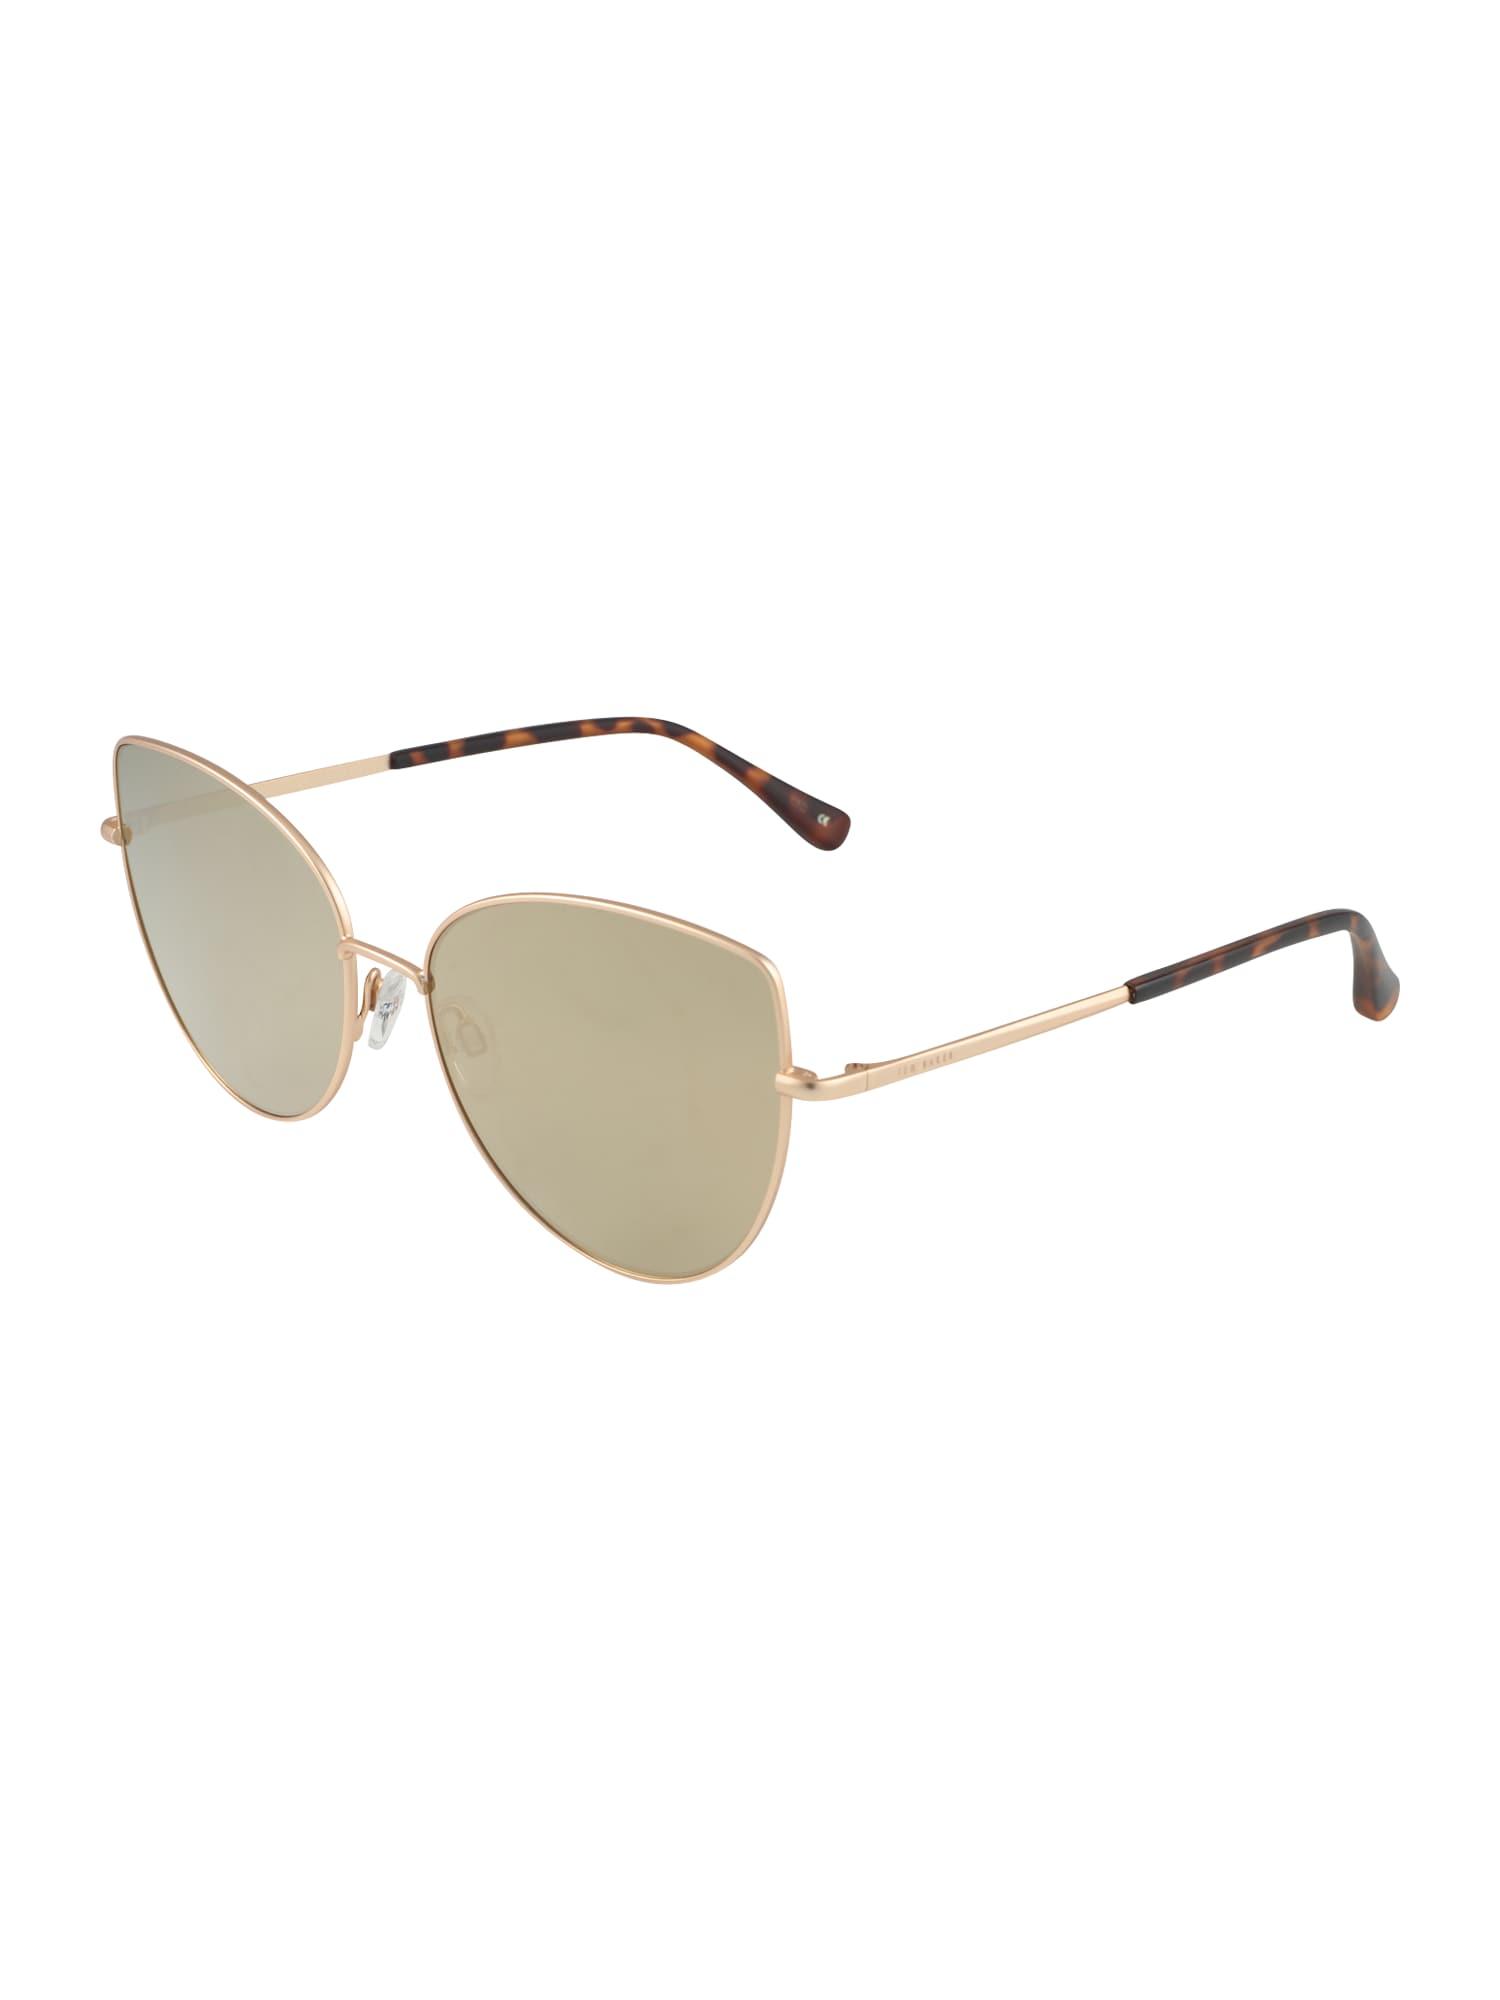 Sonnenbrille | Accessoires > Sonnenbrillen | Gold | Ted Baker